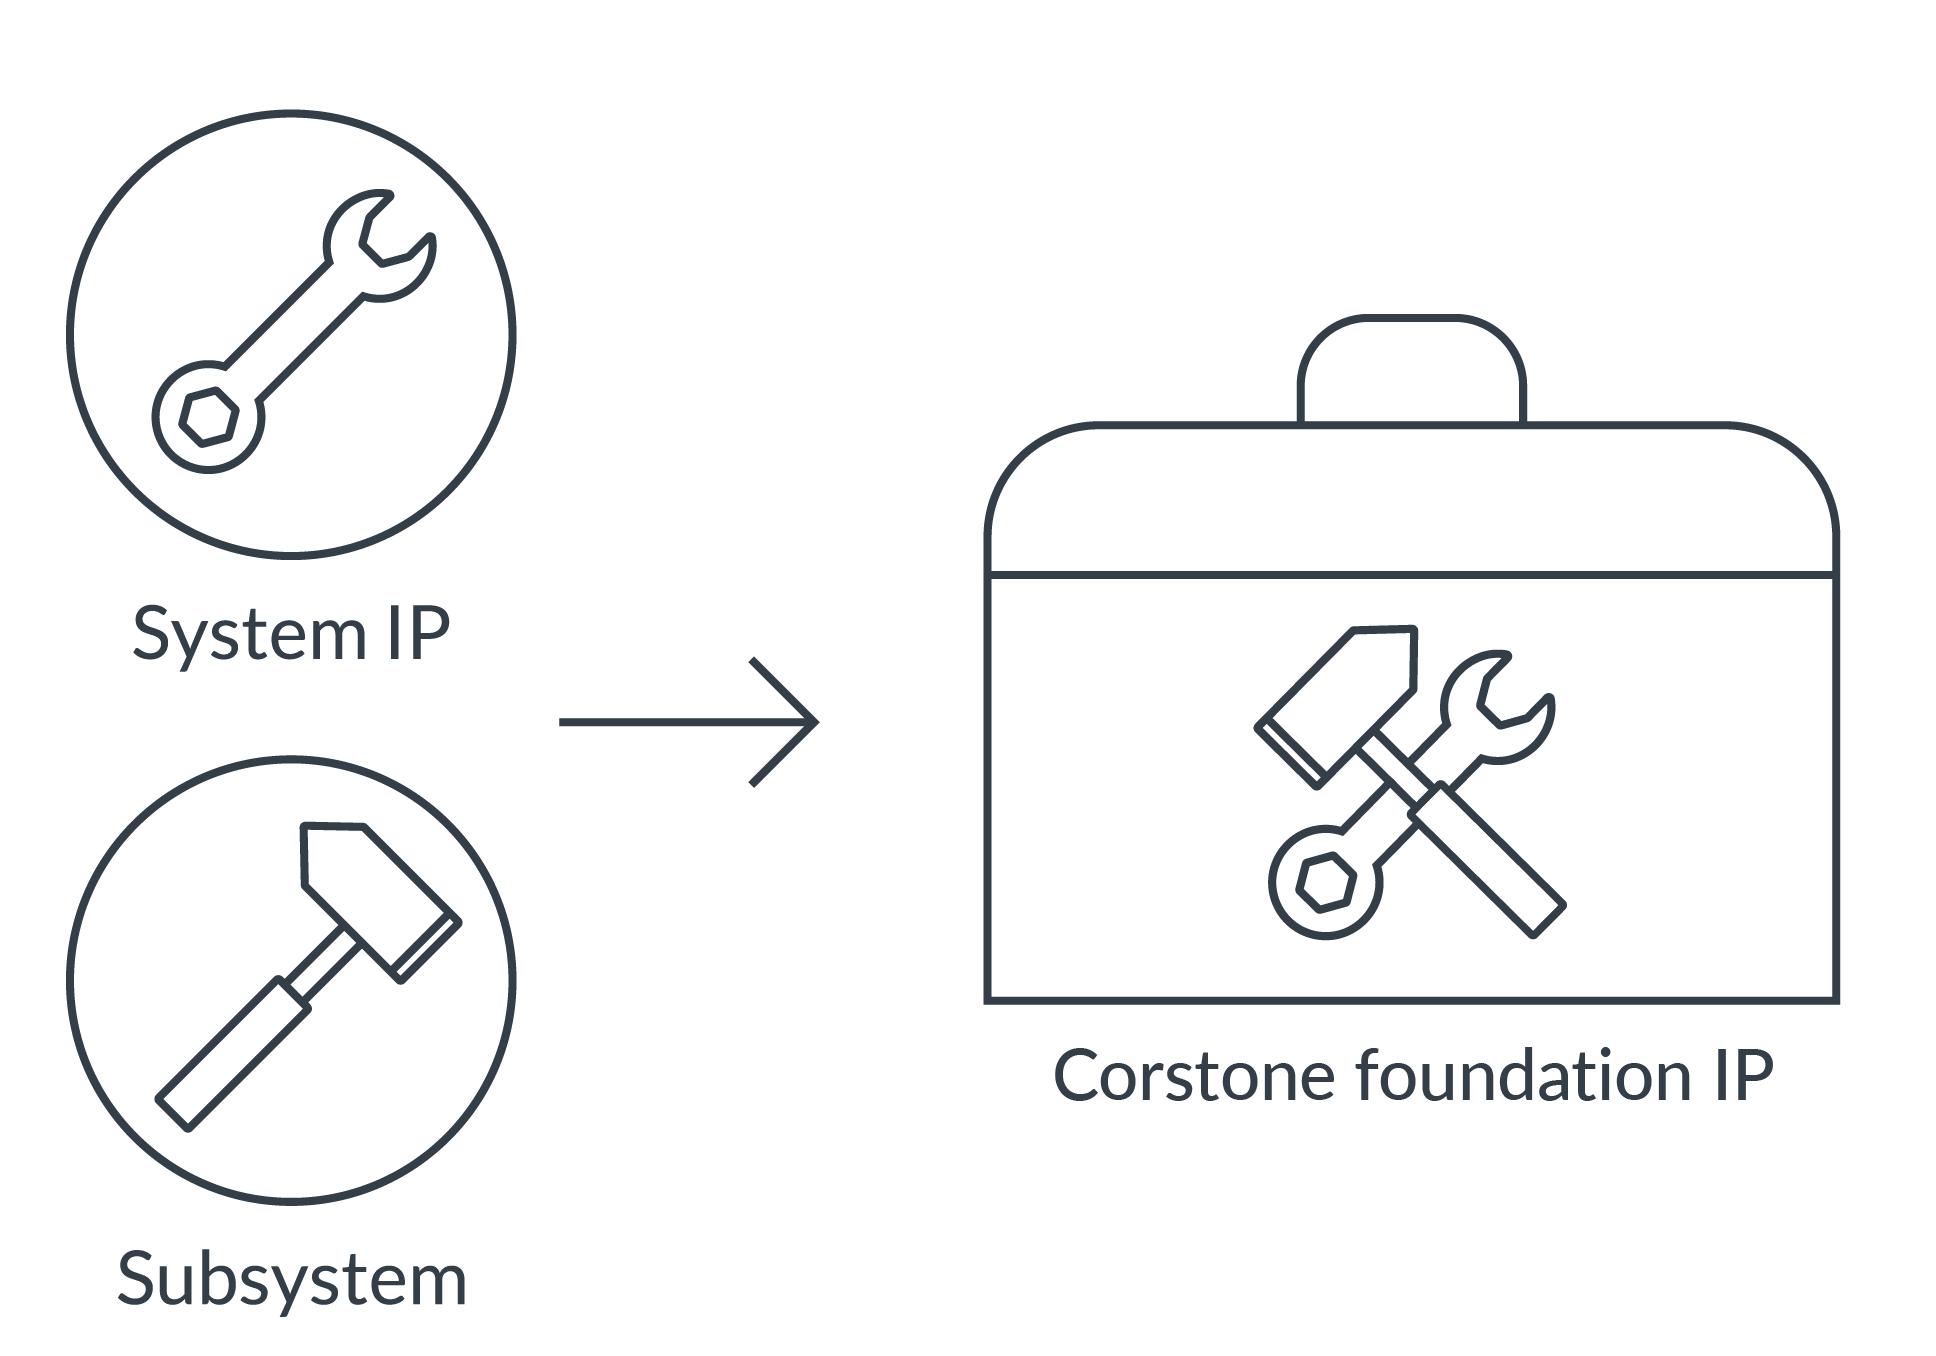 Corstone Foundation IP – Arm Developer